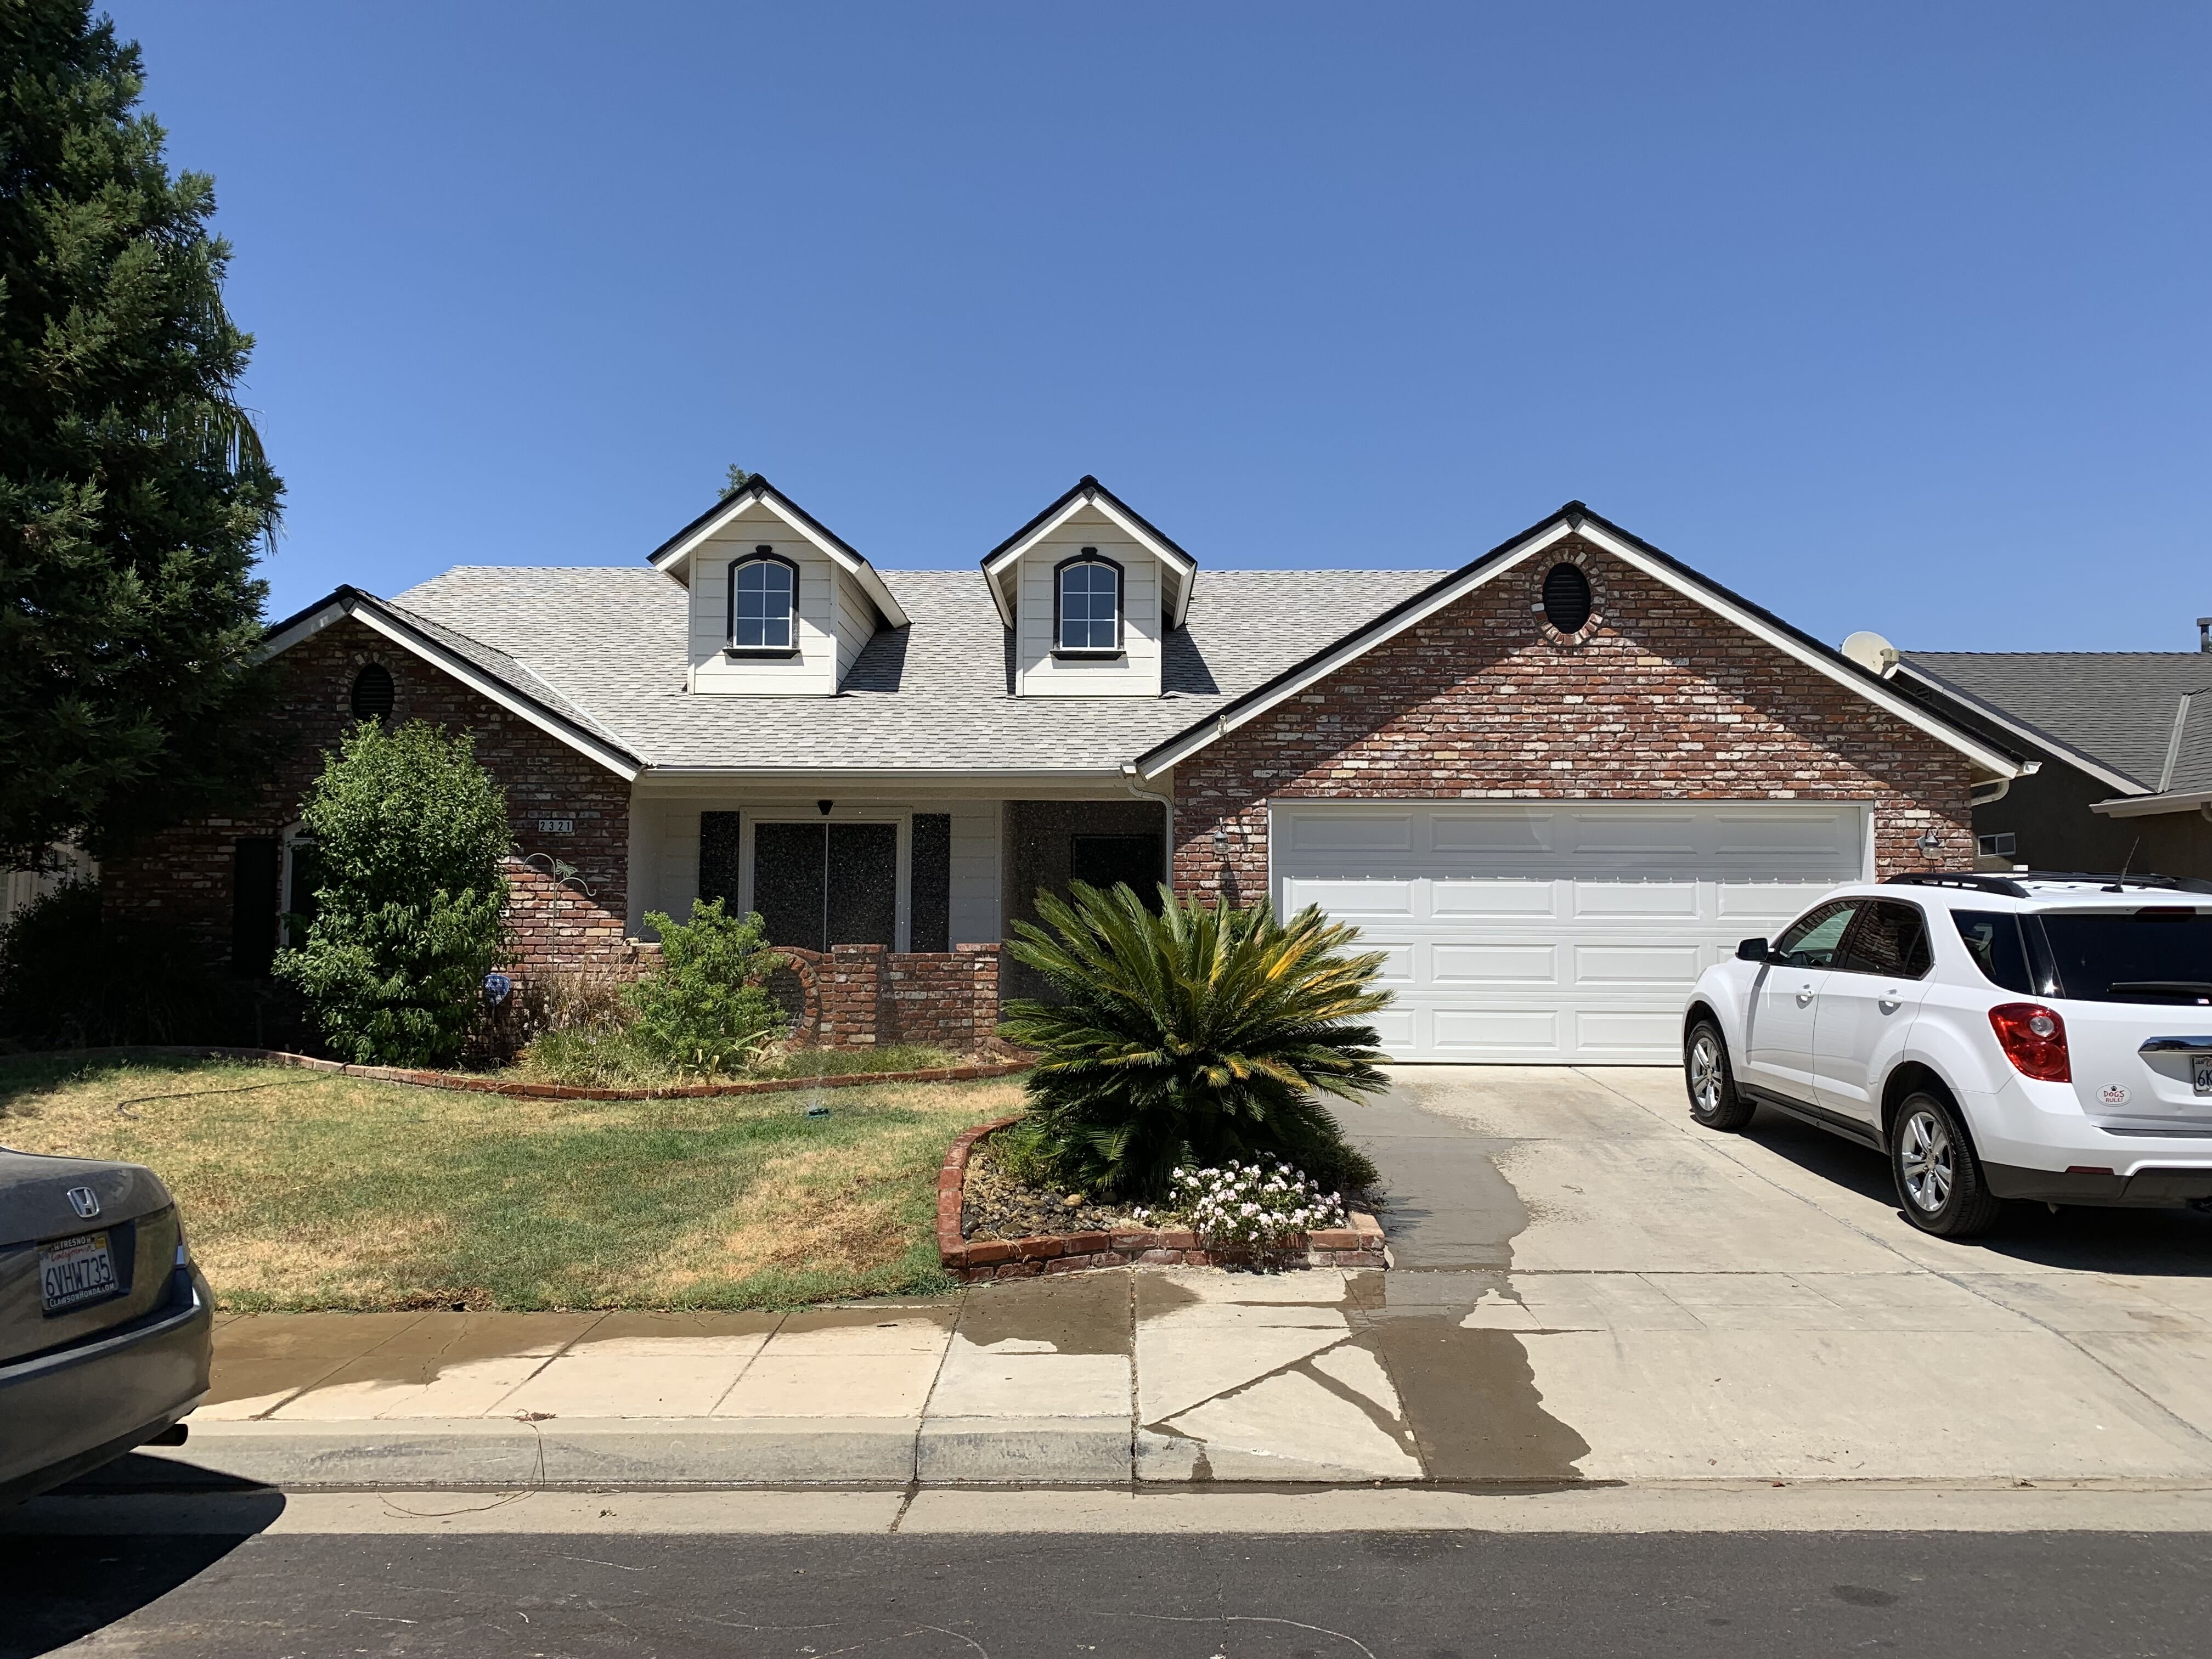 Clovis, CA - $340,000.00